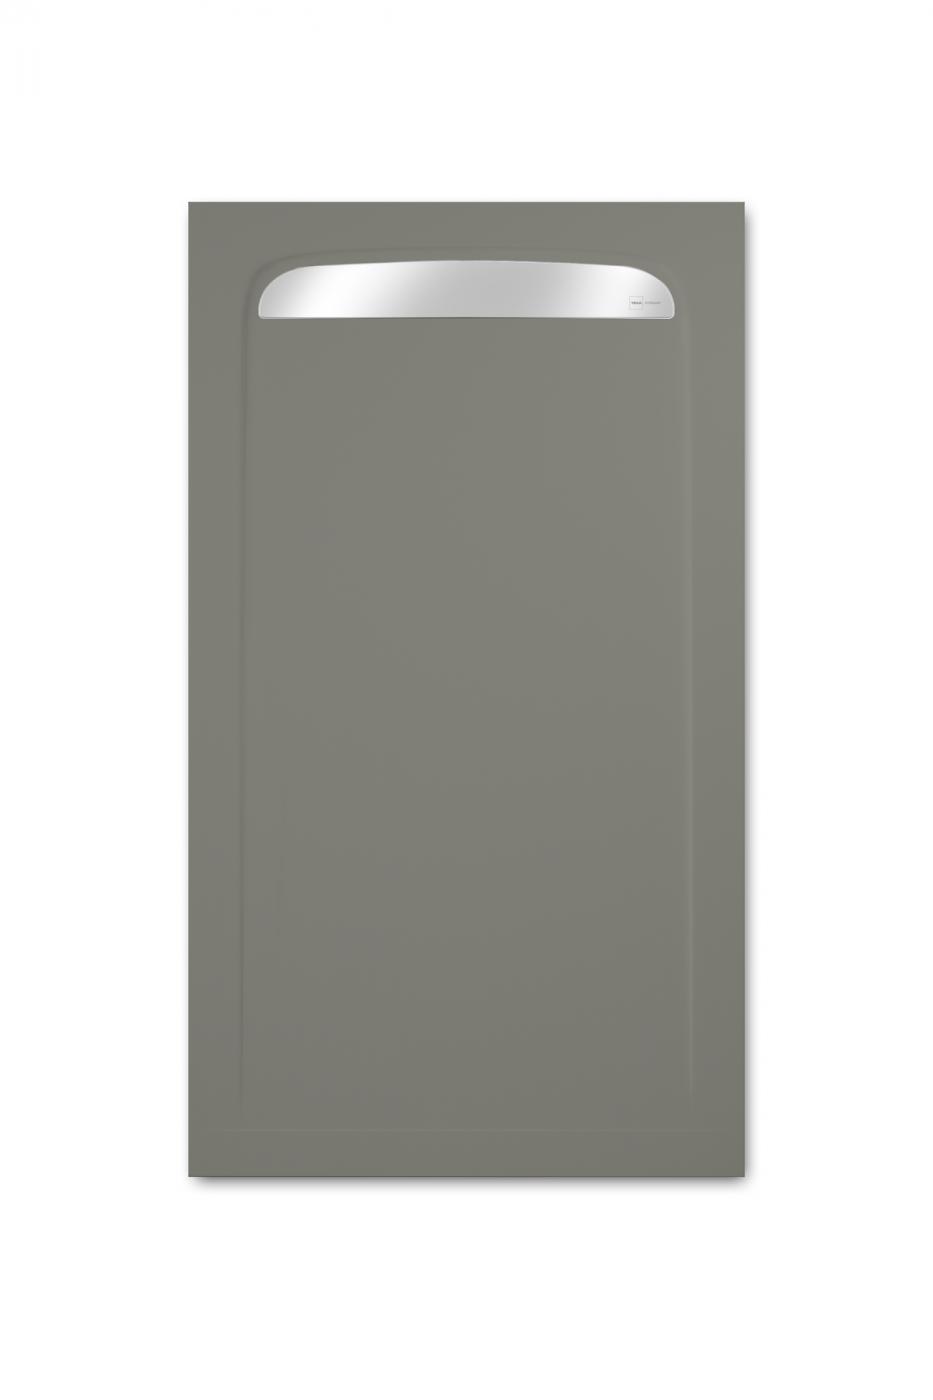 Shower tray XL - 70cm width